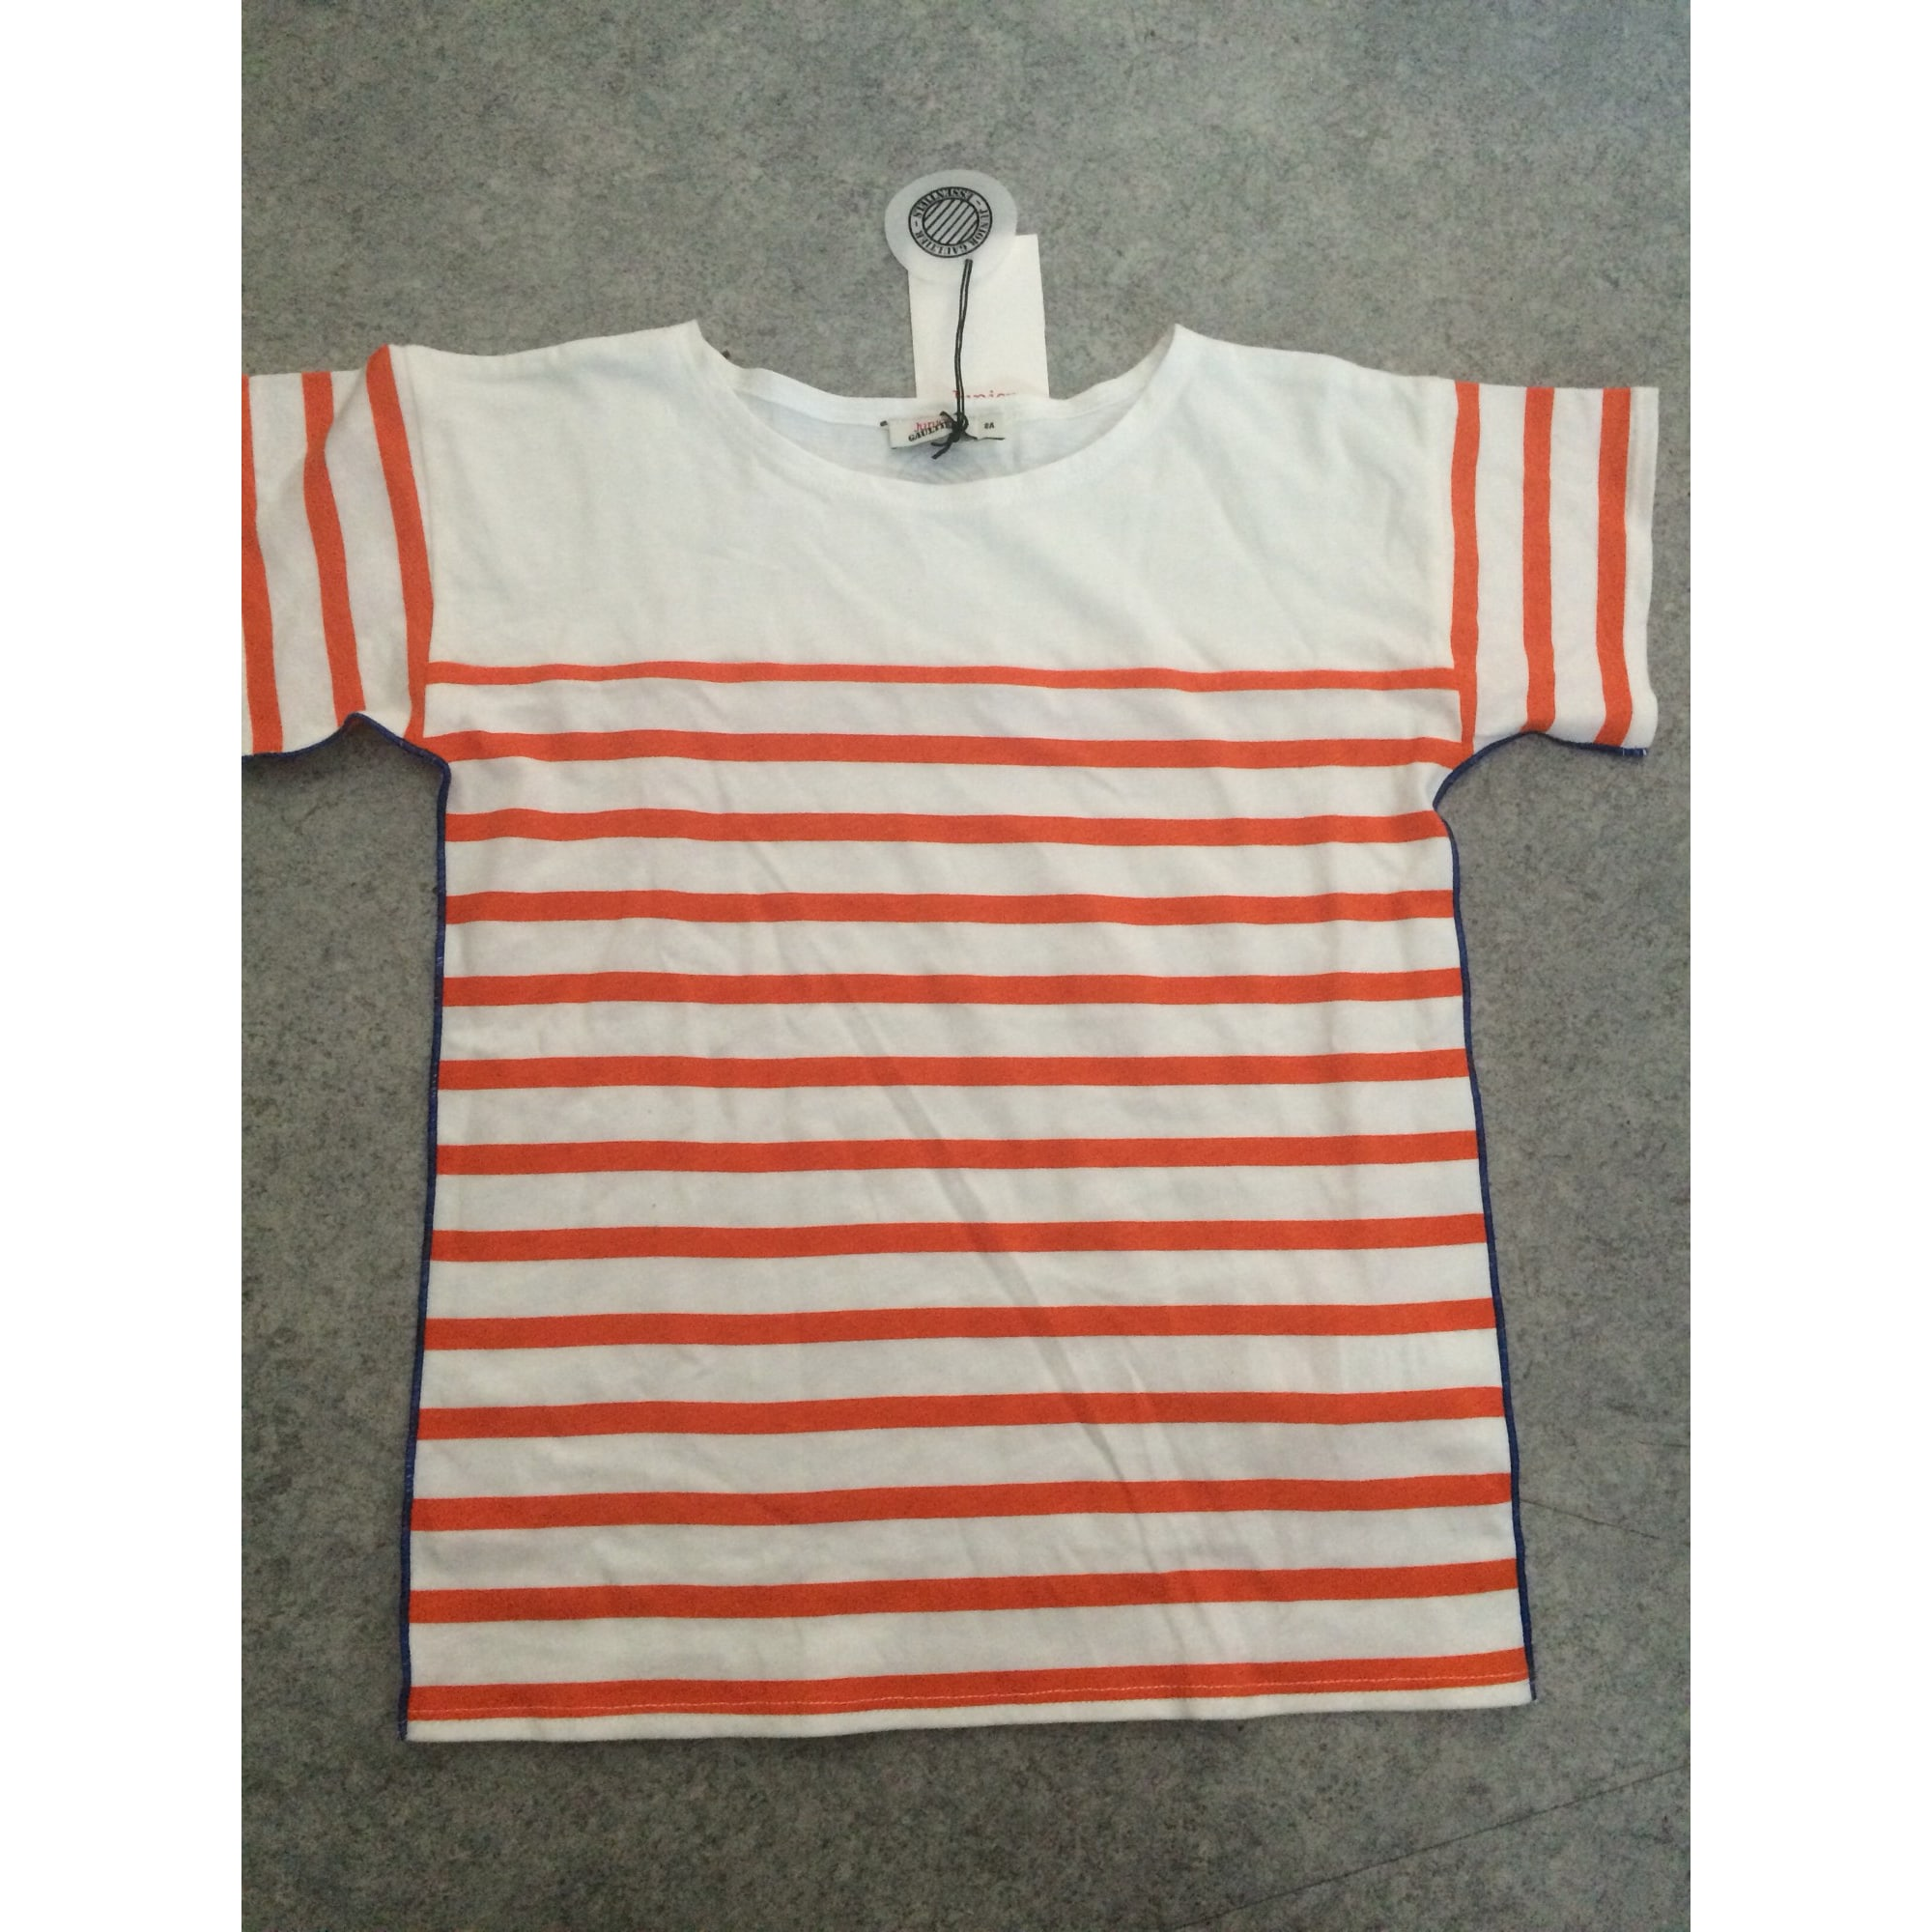 Top, Tee-shirt JEAN PAUL GAULTIER coton orange 7-8 ans